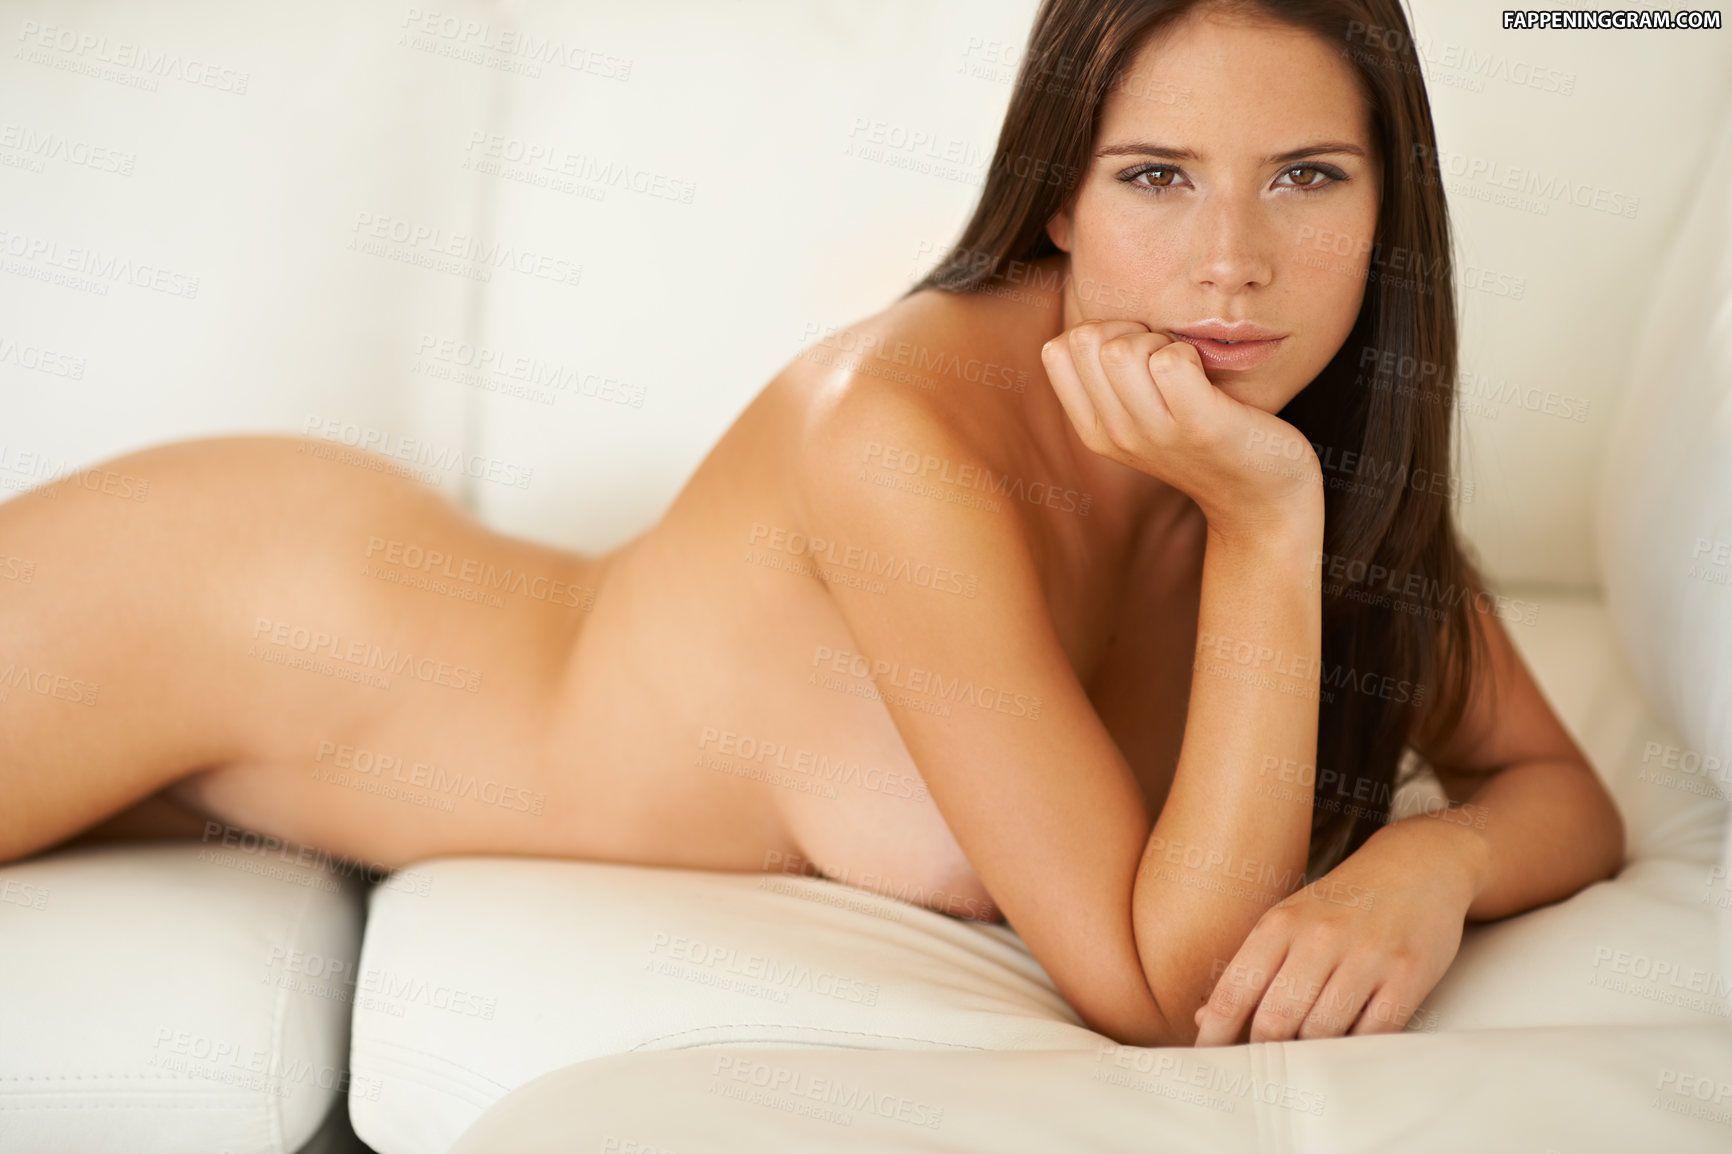 Ariirau nackt Tekurarere iPad: Nude